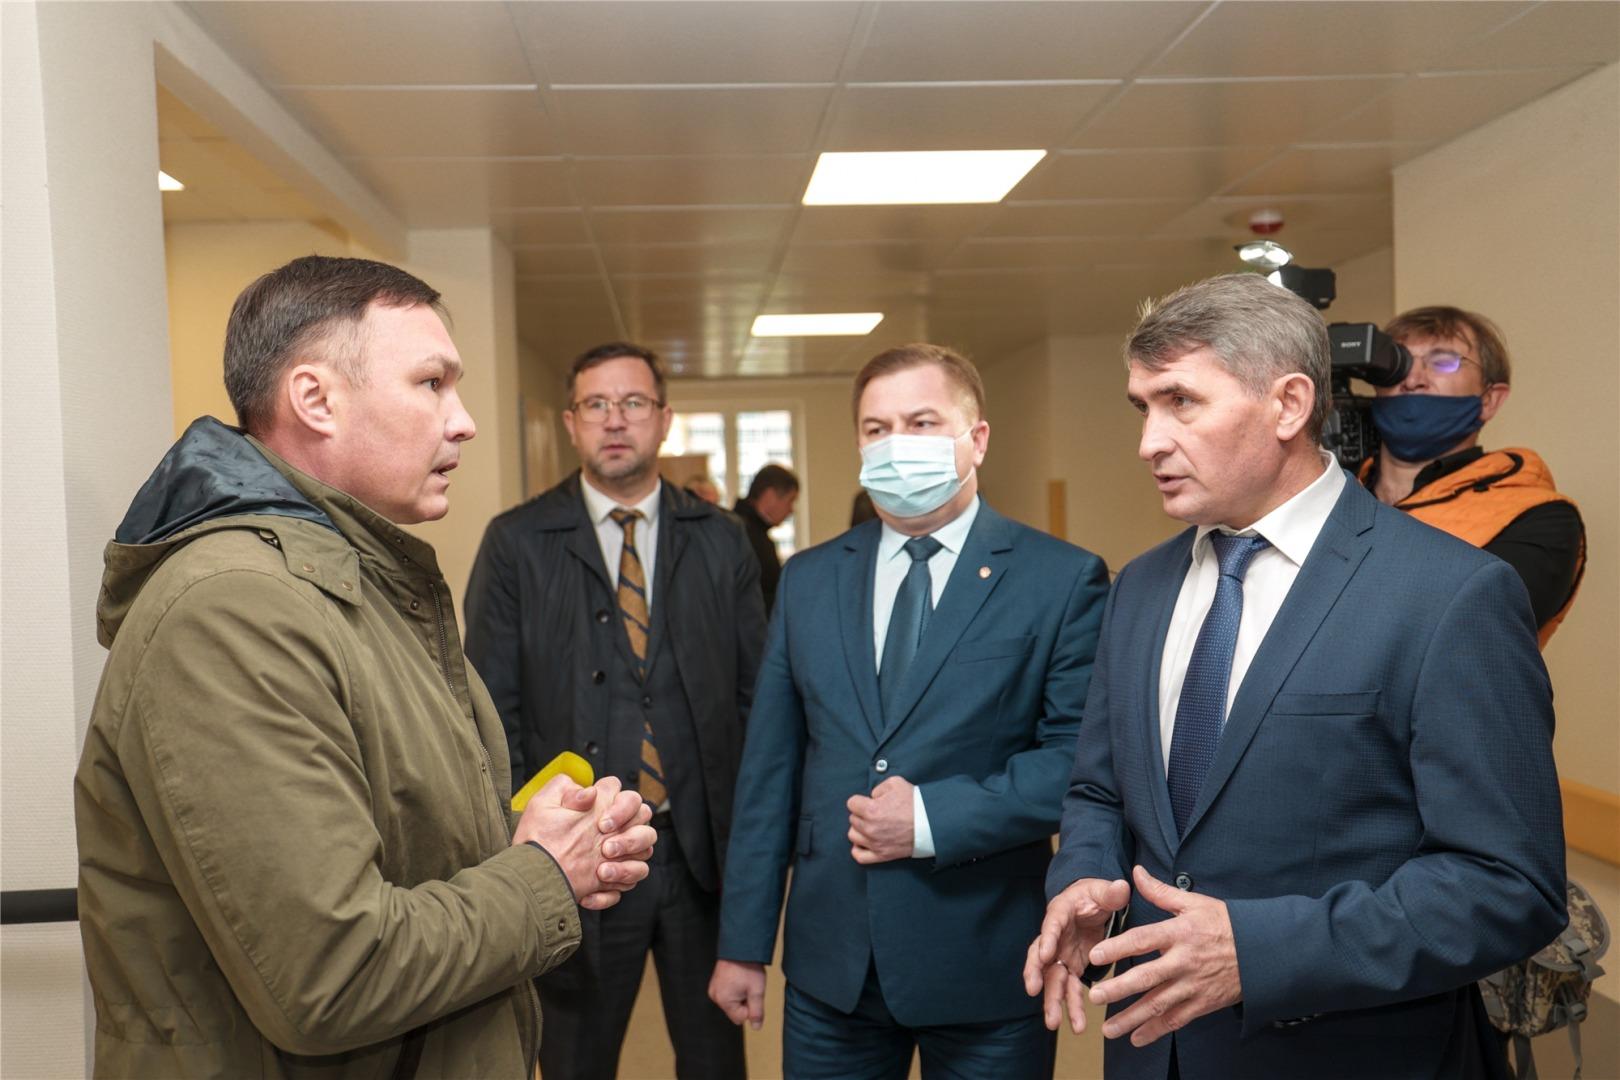 Олег Николаев объяснил, почему его часто видят на людях без маски - Новости